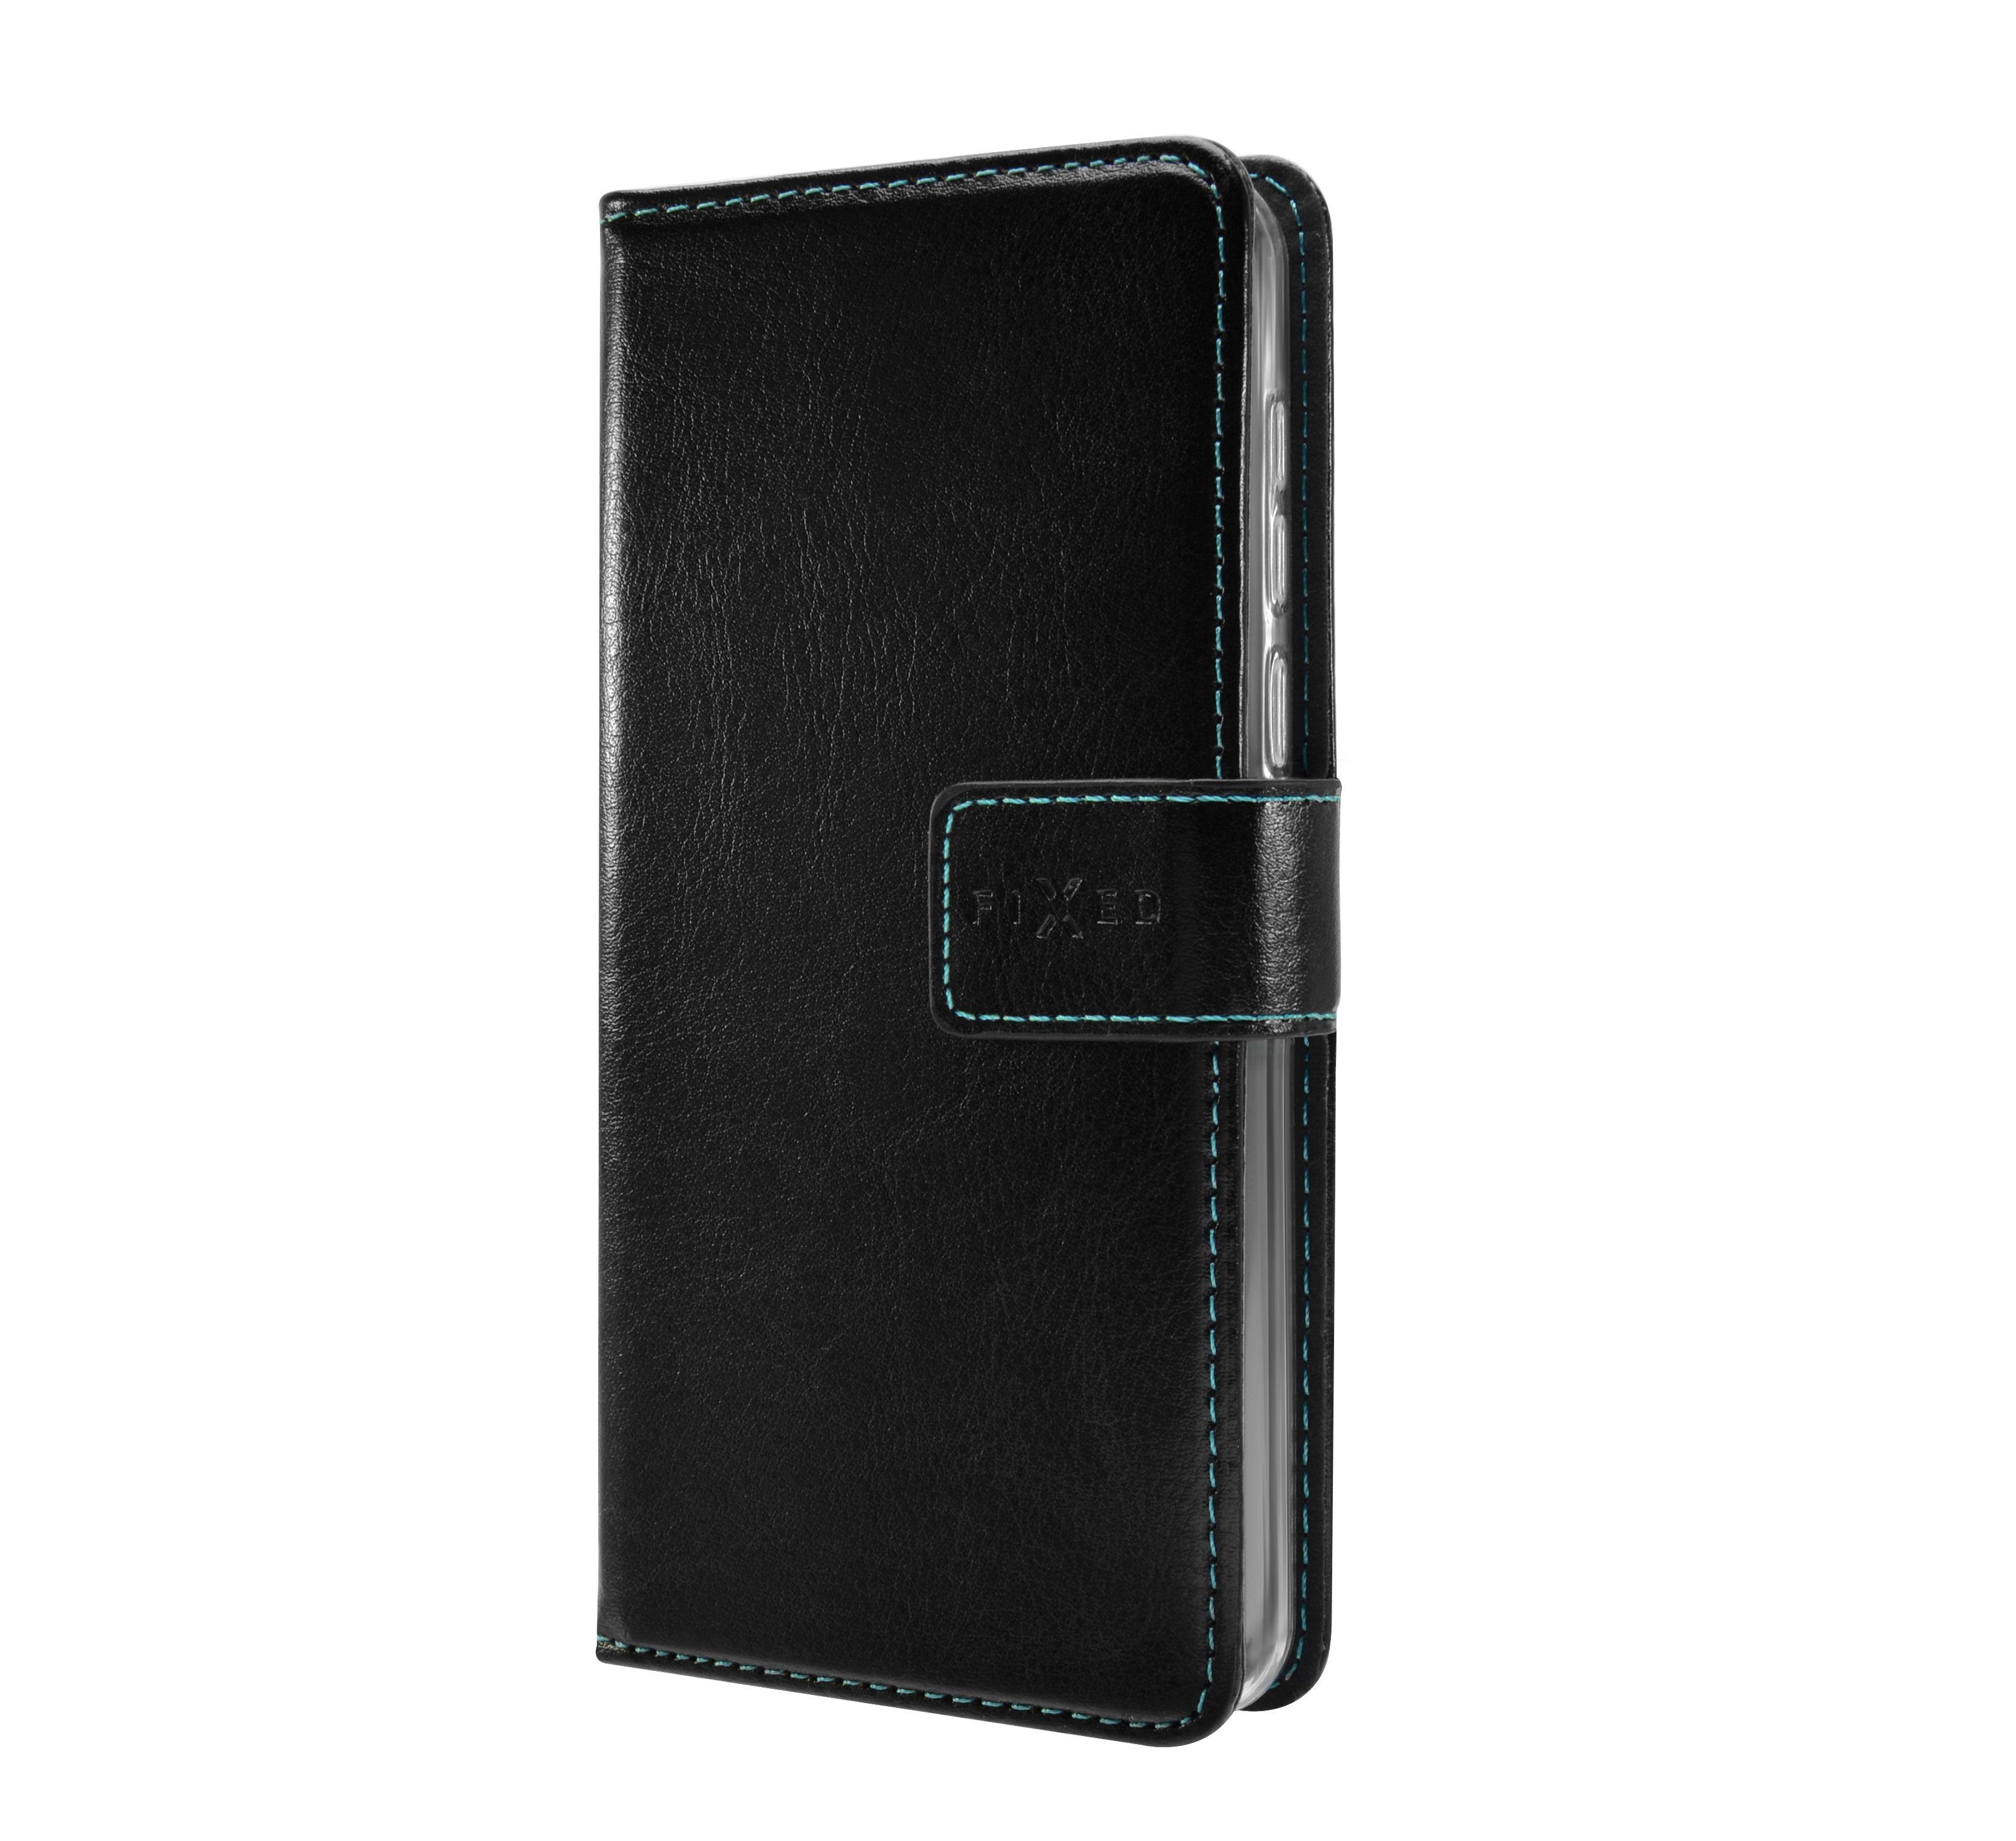 Pouzdro typu kniha FIXED Opus pro Xiaomi Redmi Go, černé